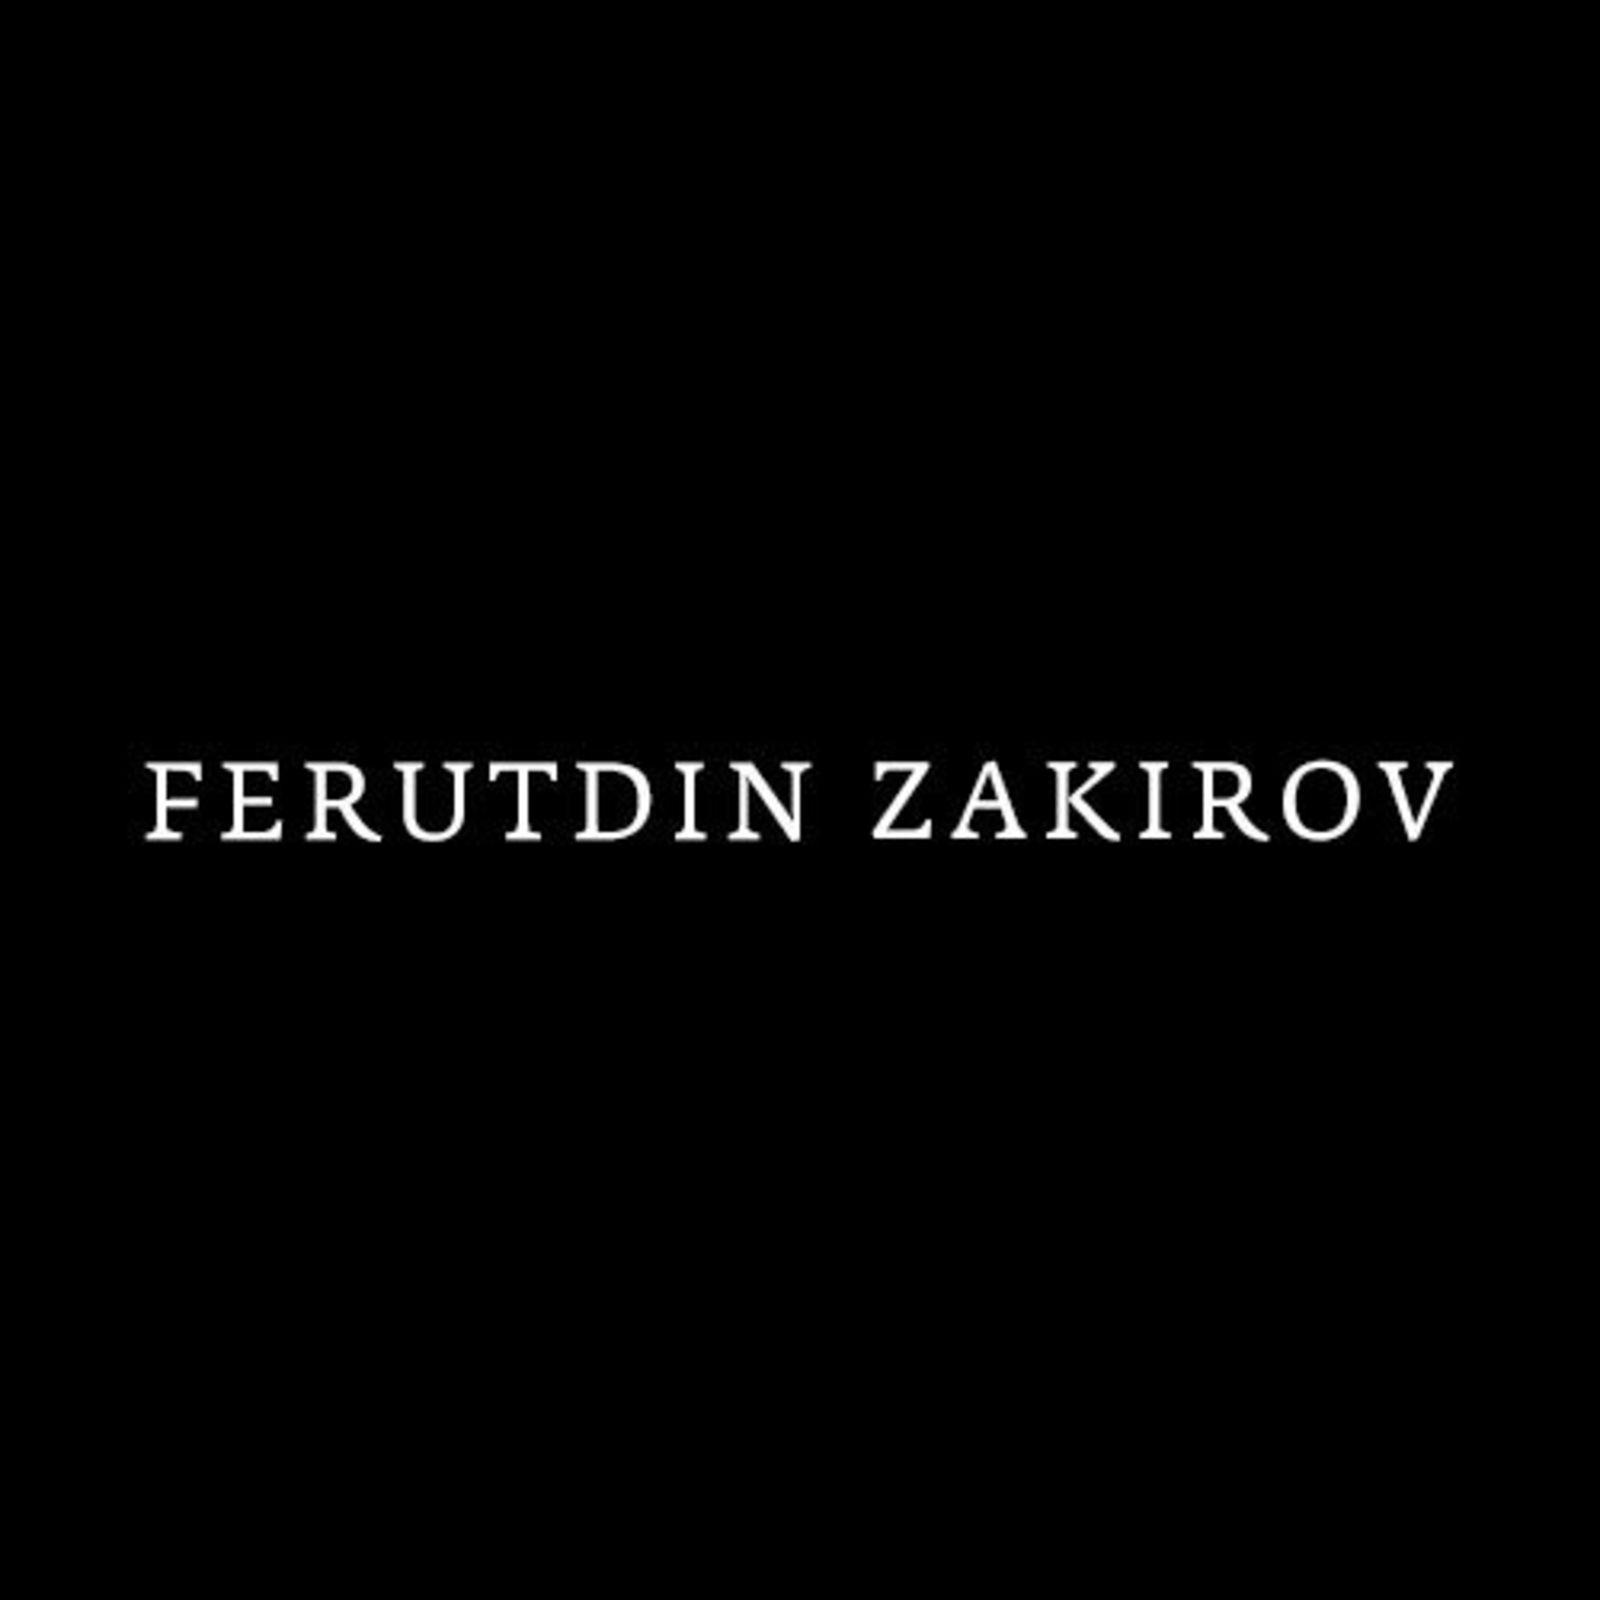 Ferutdin Zakirov